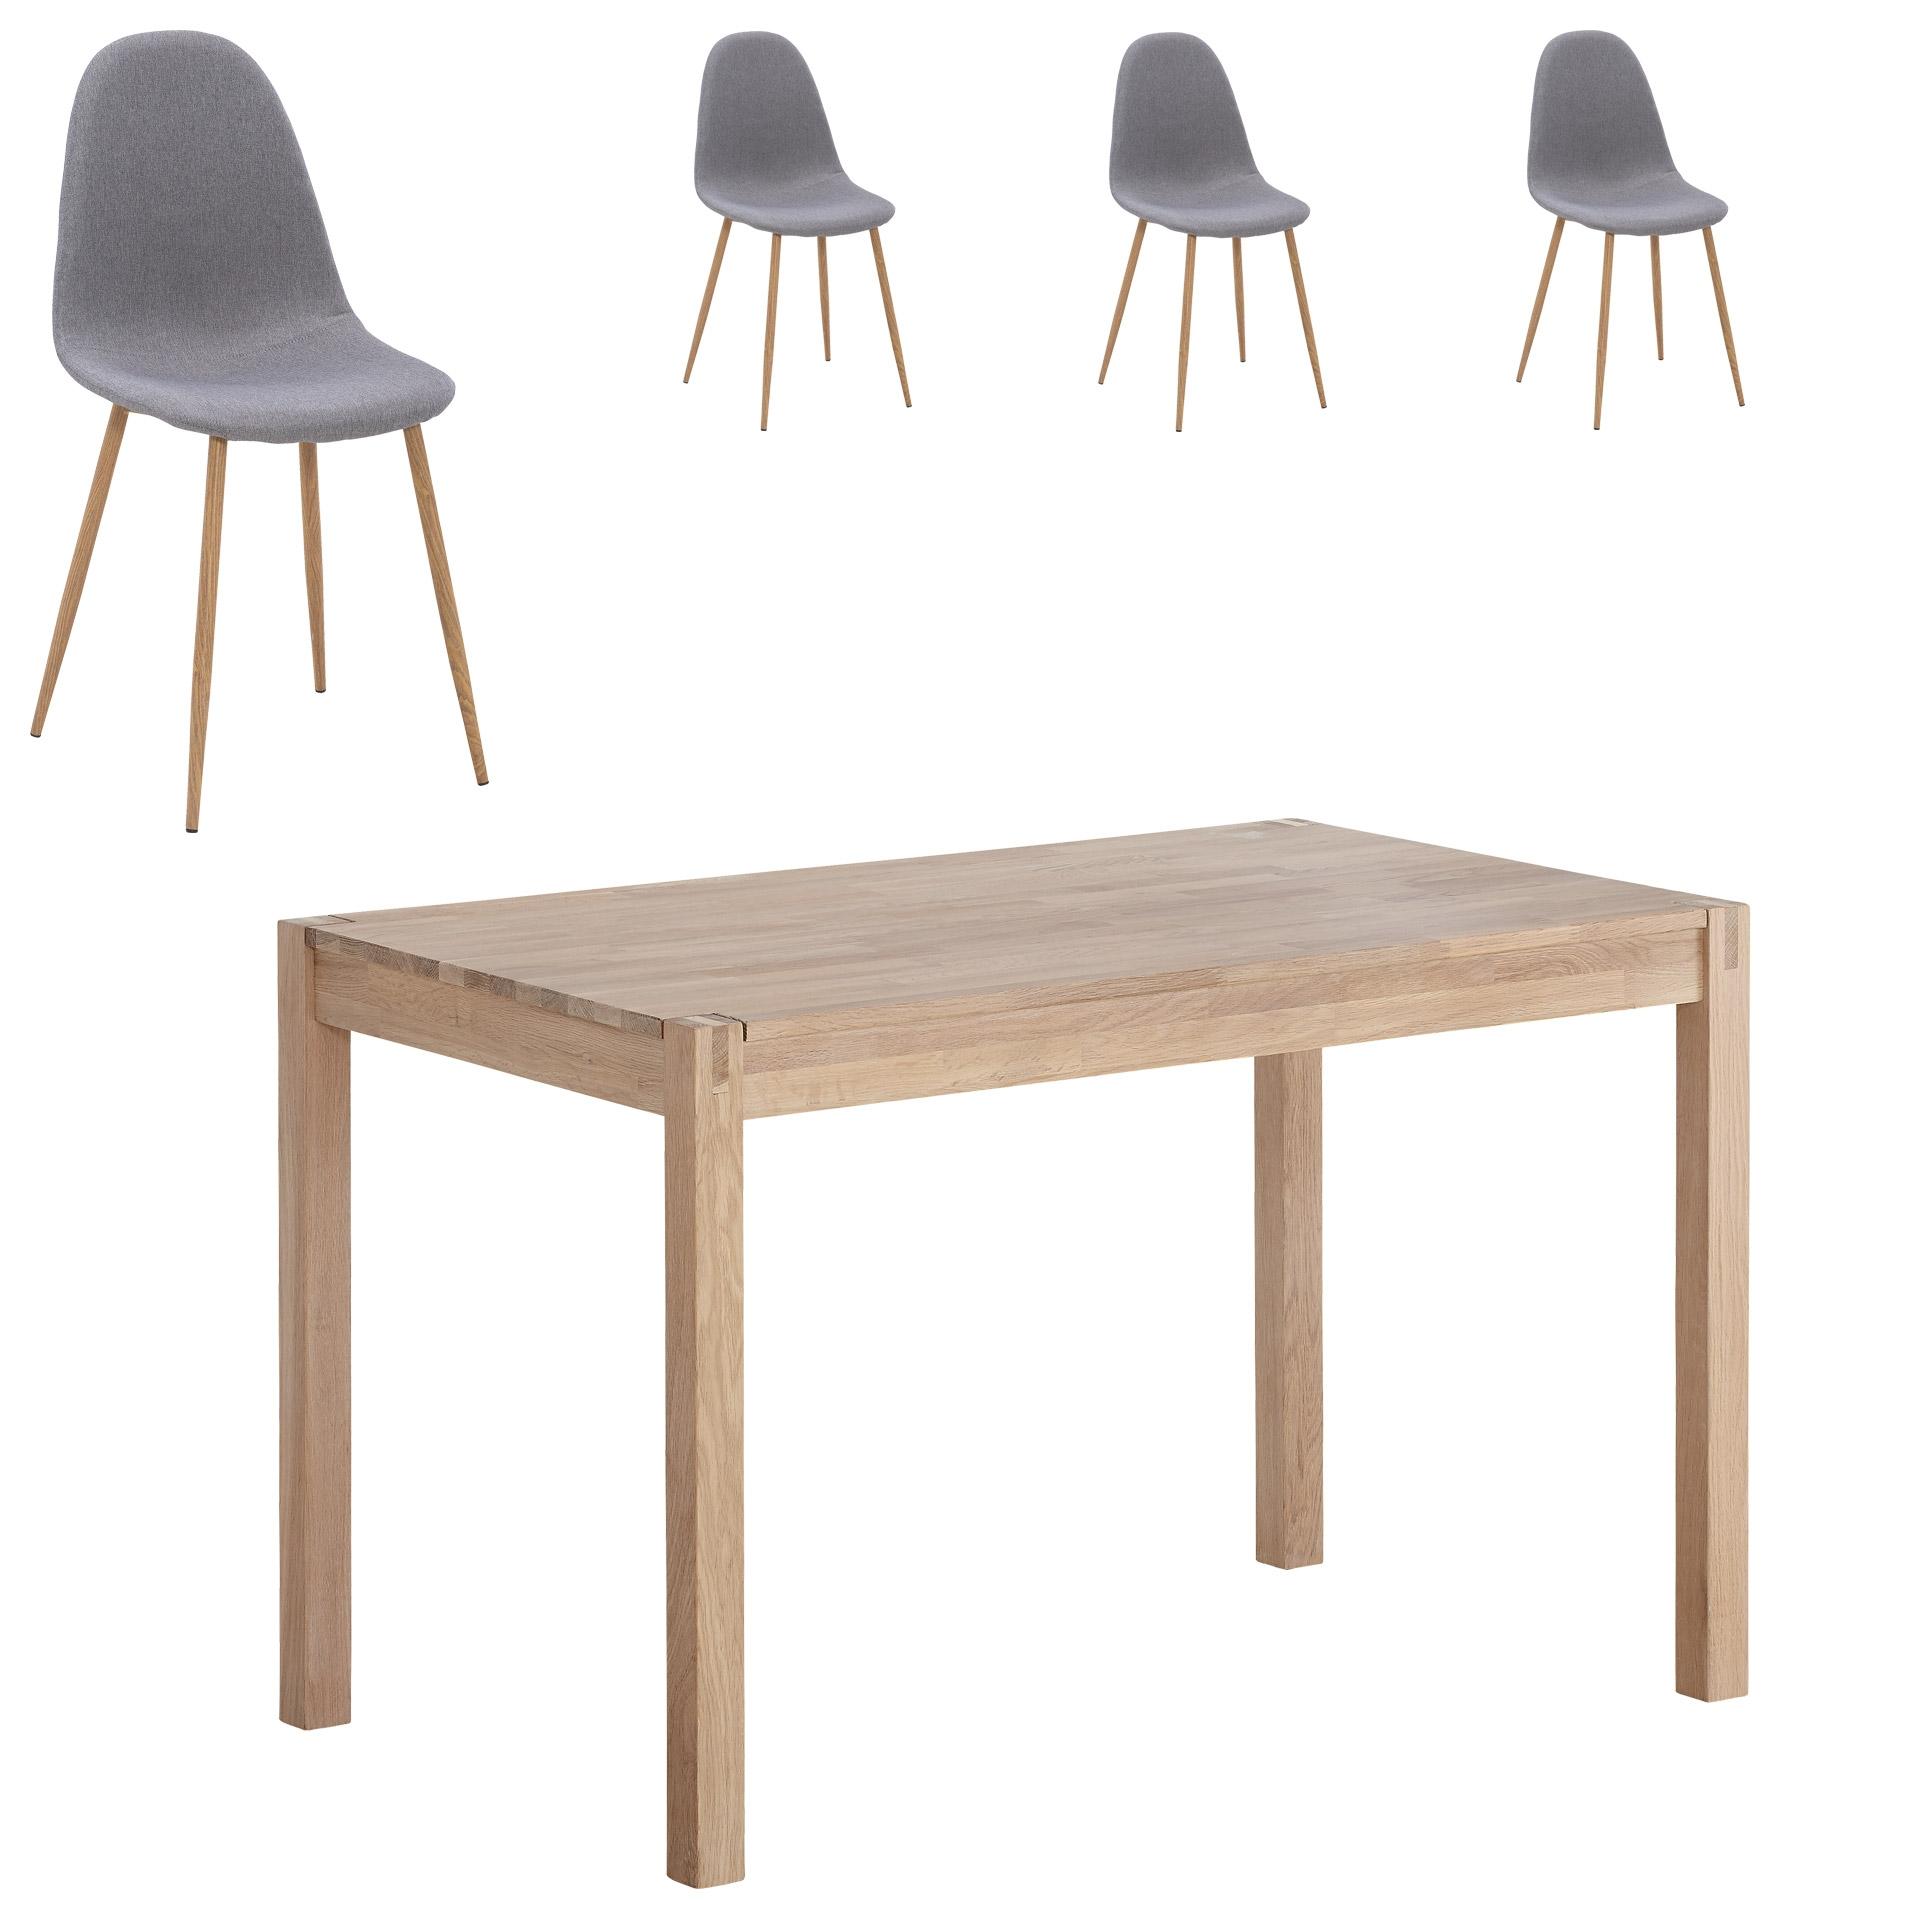 Essgruppe Ascona/Tinglev (70x115, 4 Stühle)